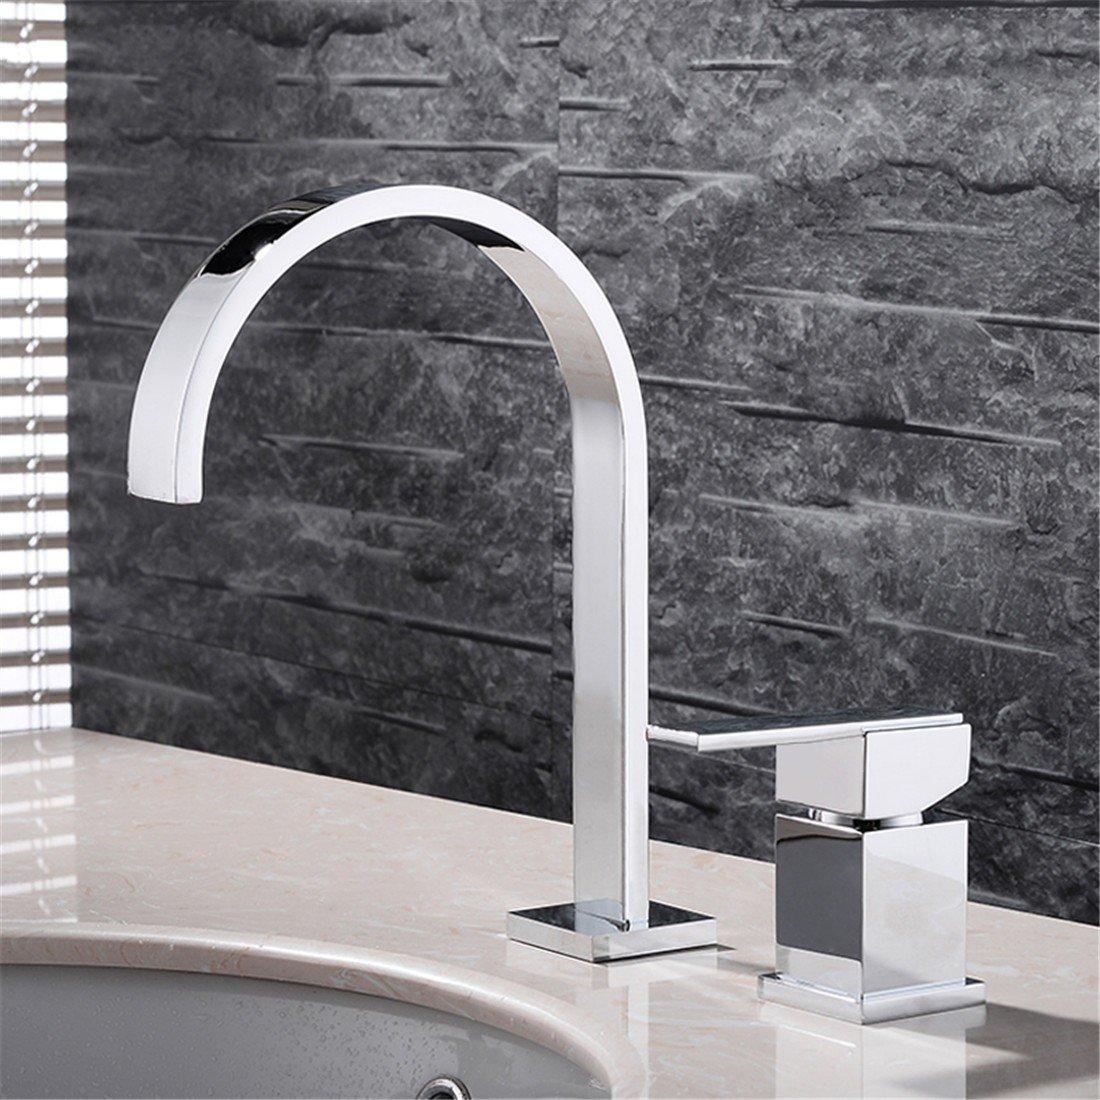 Stazsx Contemporary Bathroom Brass Basin tap Antique Retro Basin Mixer Tap Ceramic Valve Core Faucet Bathroom Sink Tap,Single handle double hole basin faucet